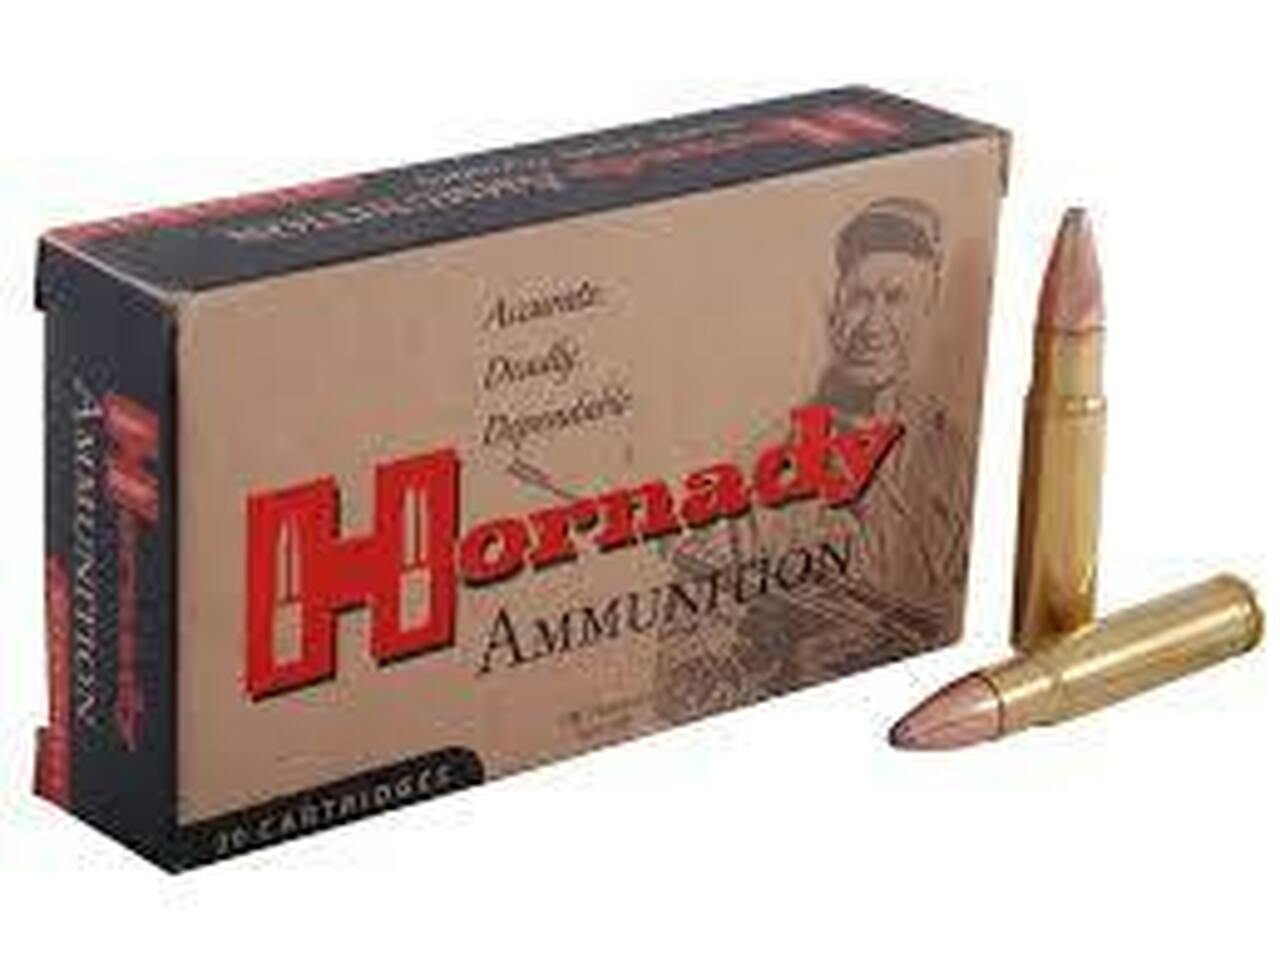 358 Win Ammo